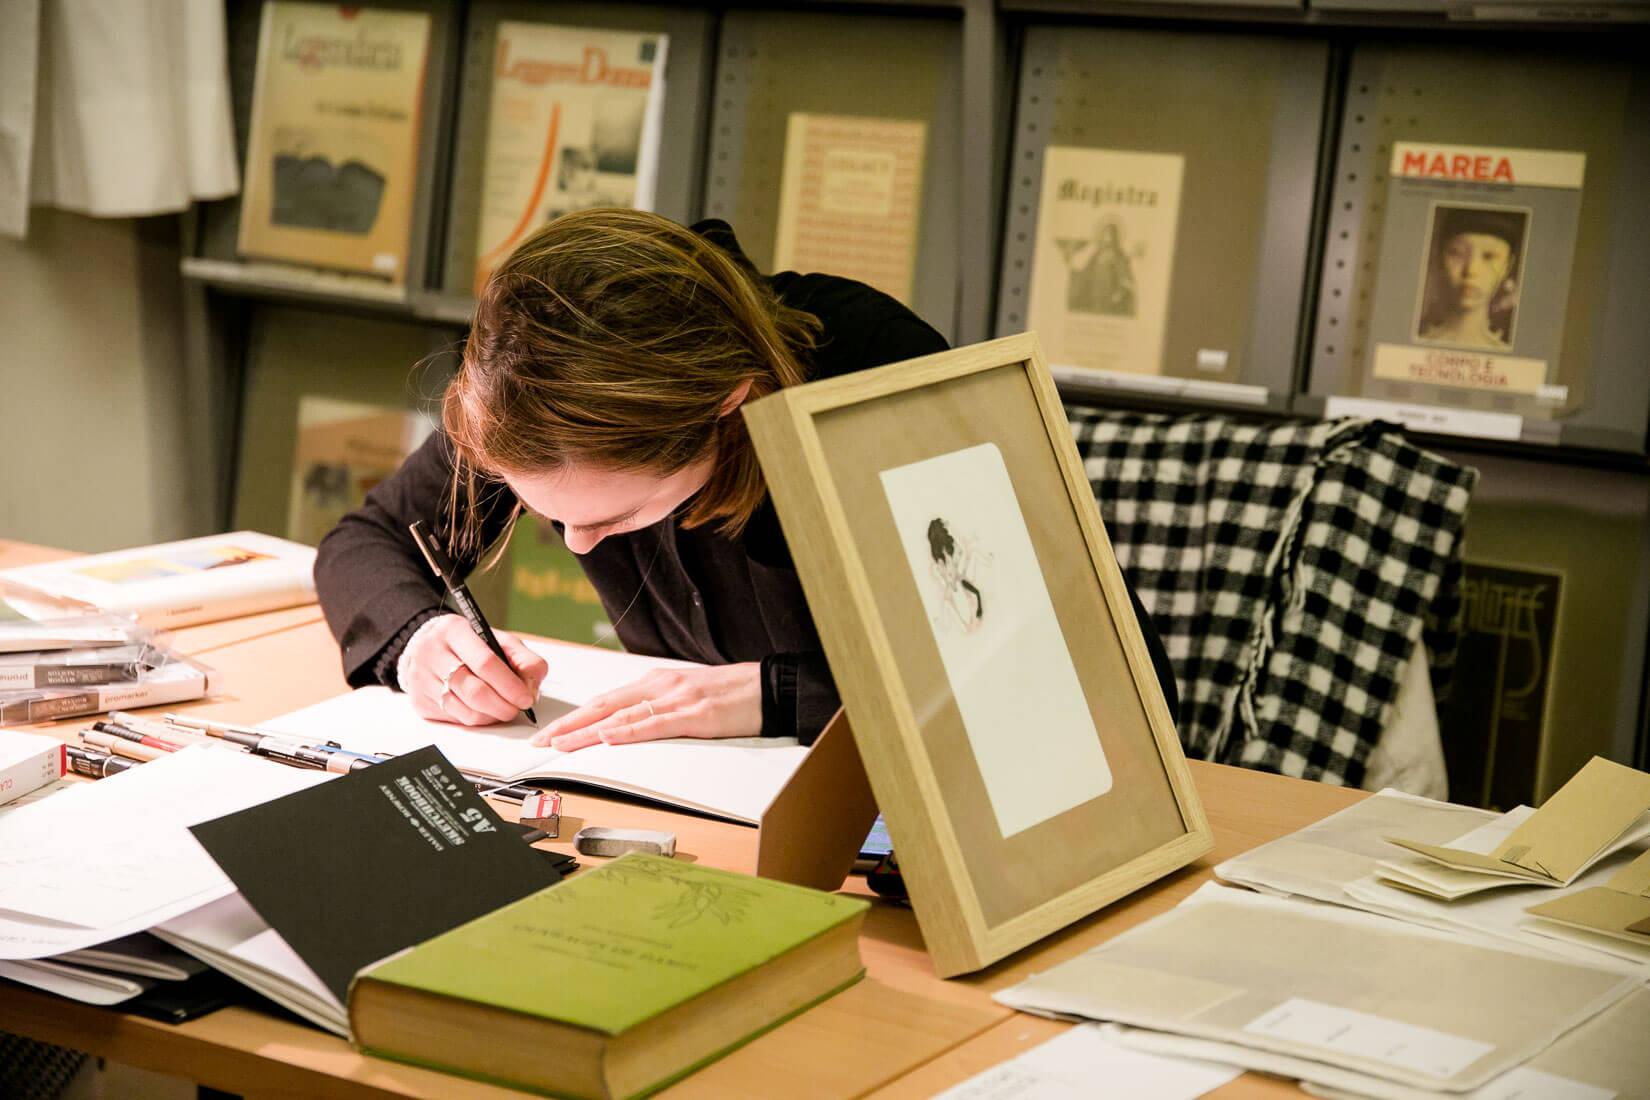 Biblioteca-delle-donne-art-city-2020-7